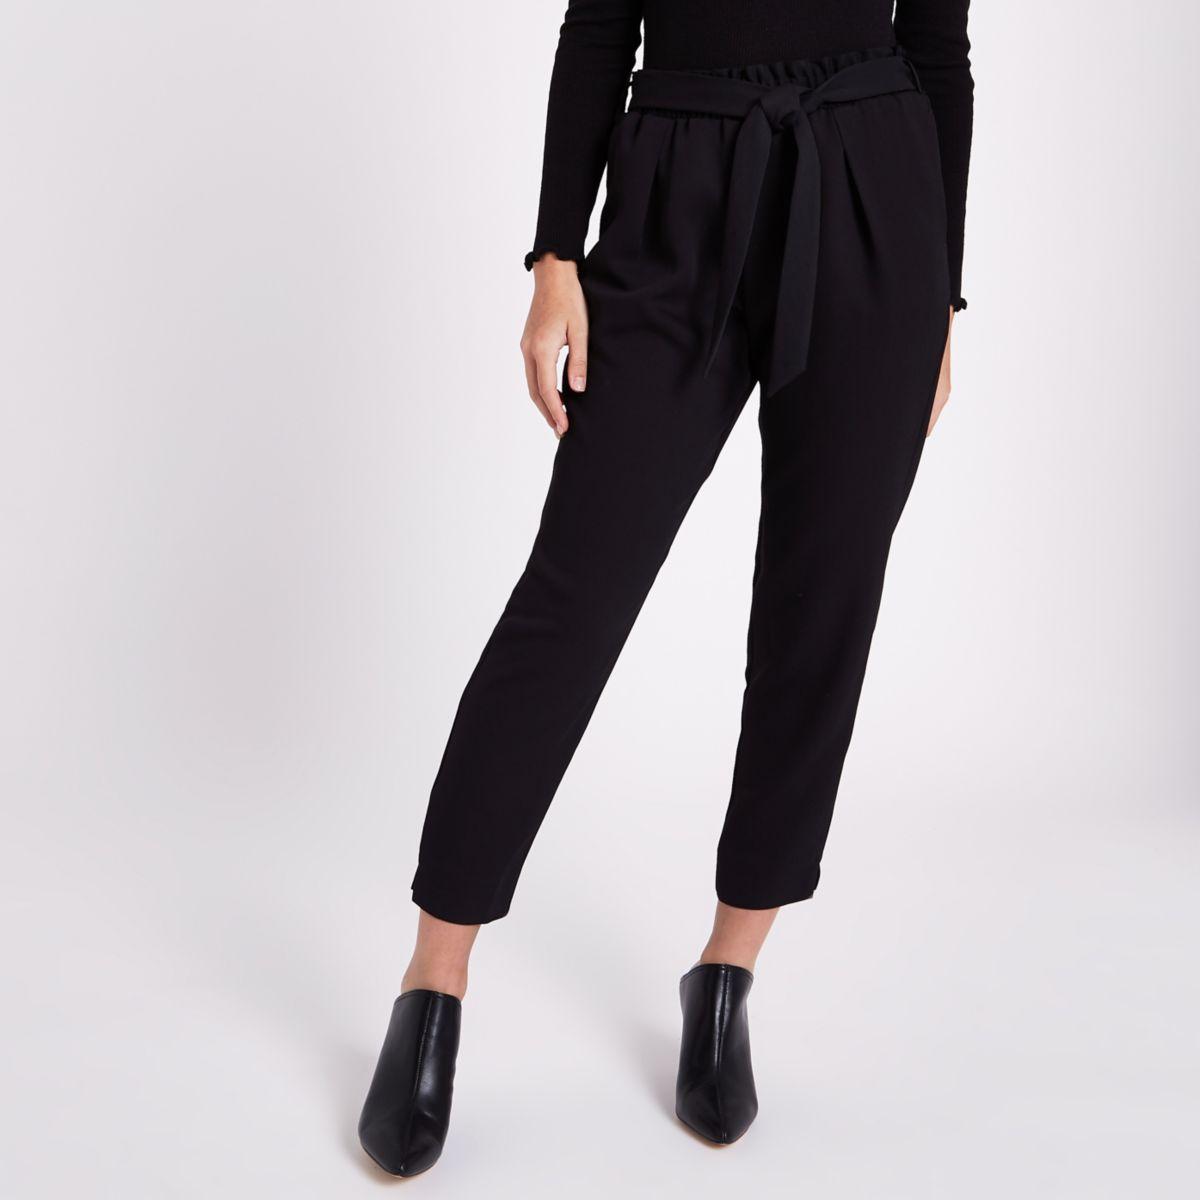 Petite black tie waist tapered trousers